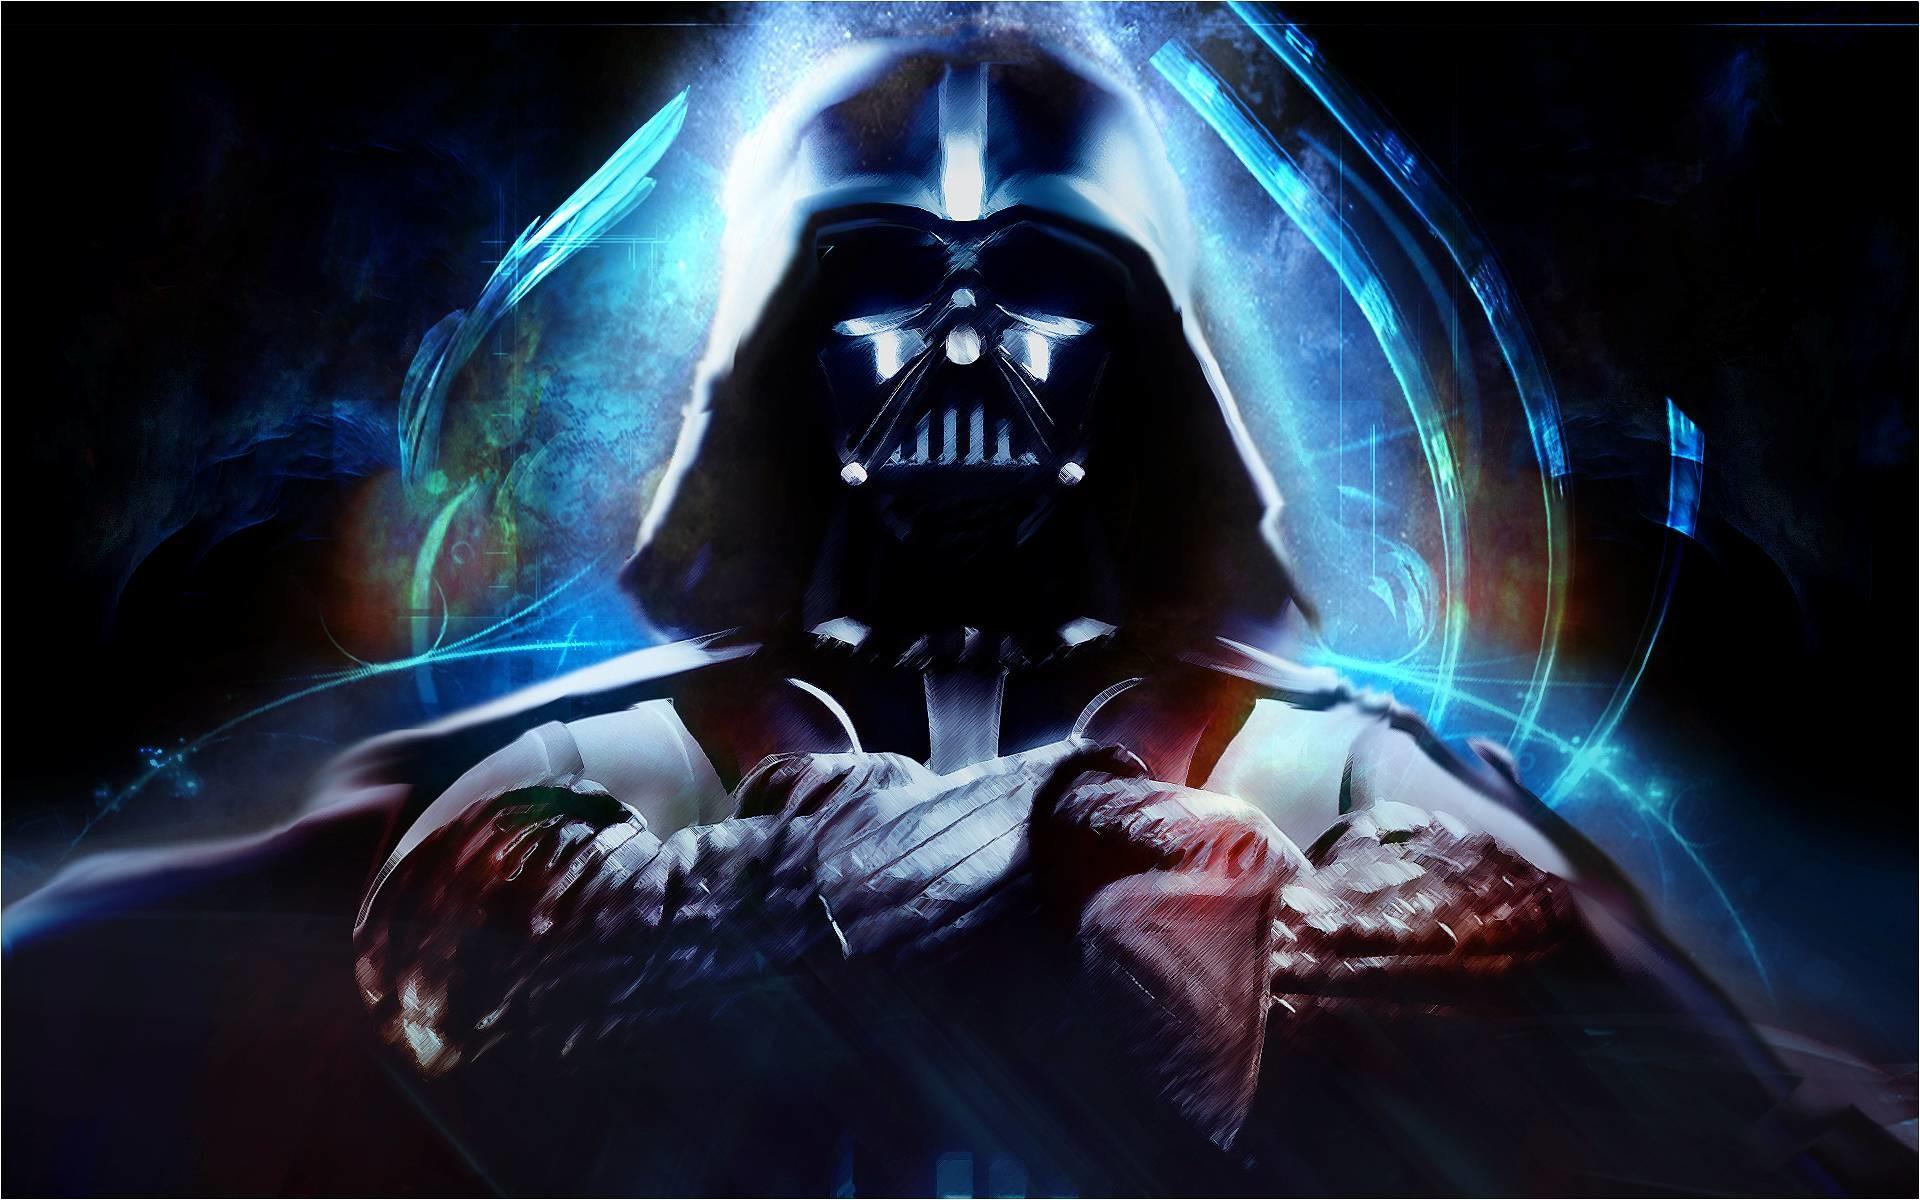 Darth Vader by SeanCoey on DeviantArt